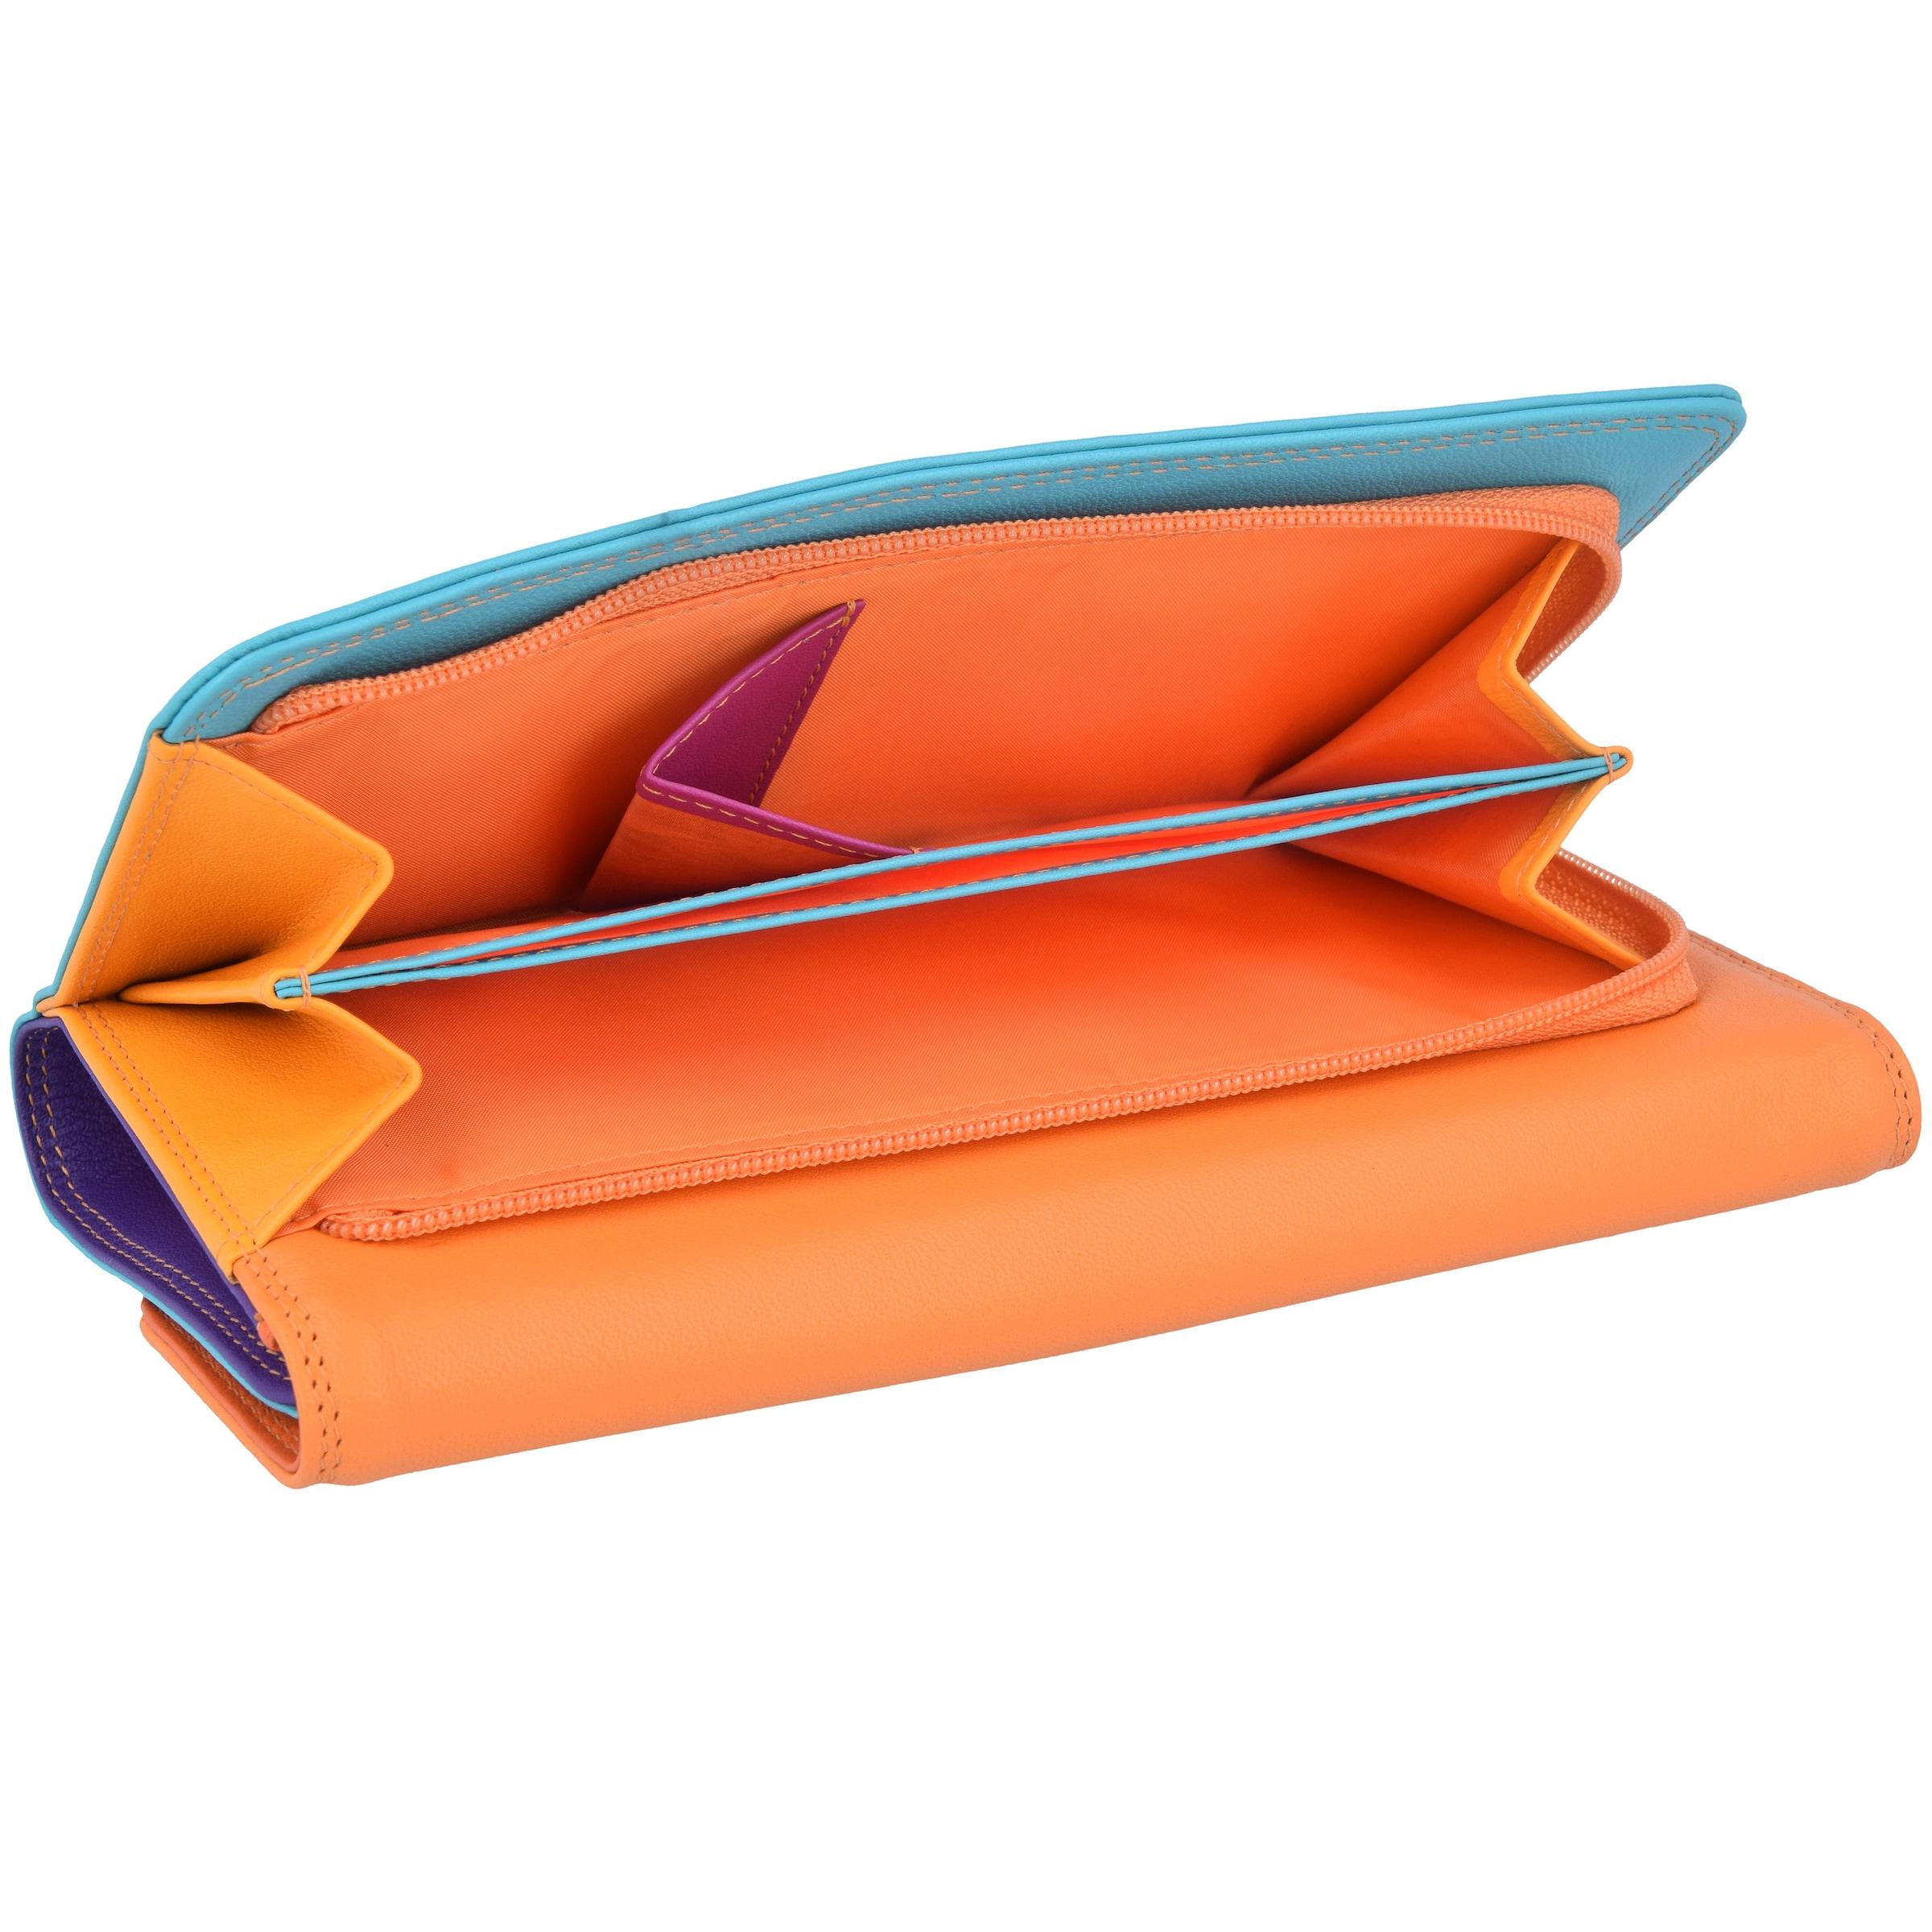 Geldbörse Neonorange 'tri Mywalit In Orange TürkisNeonlila fold' Neonpink iOkZXPu